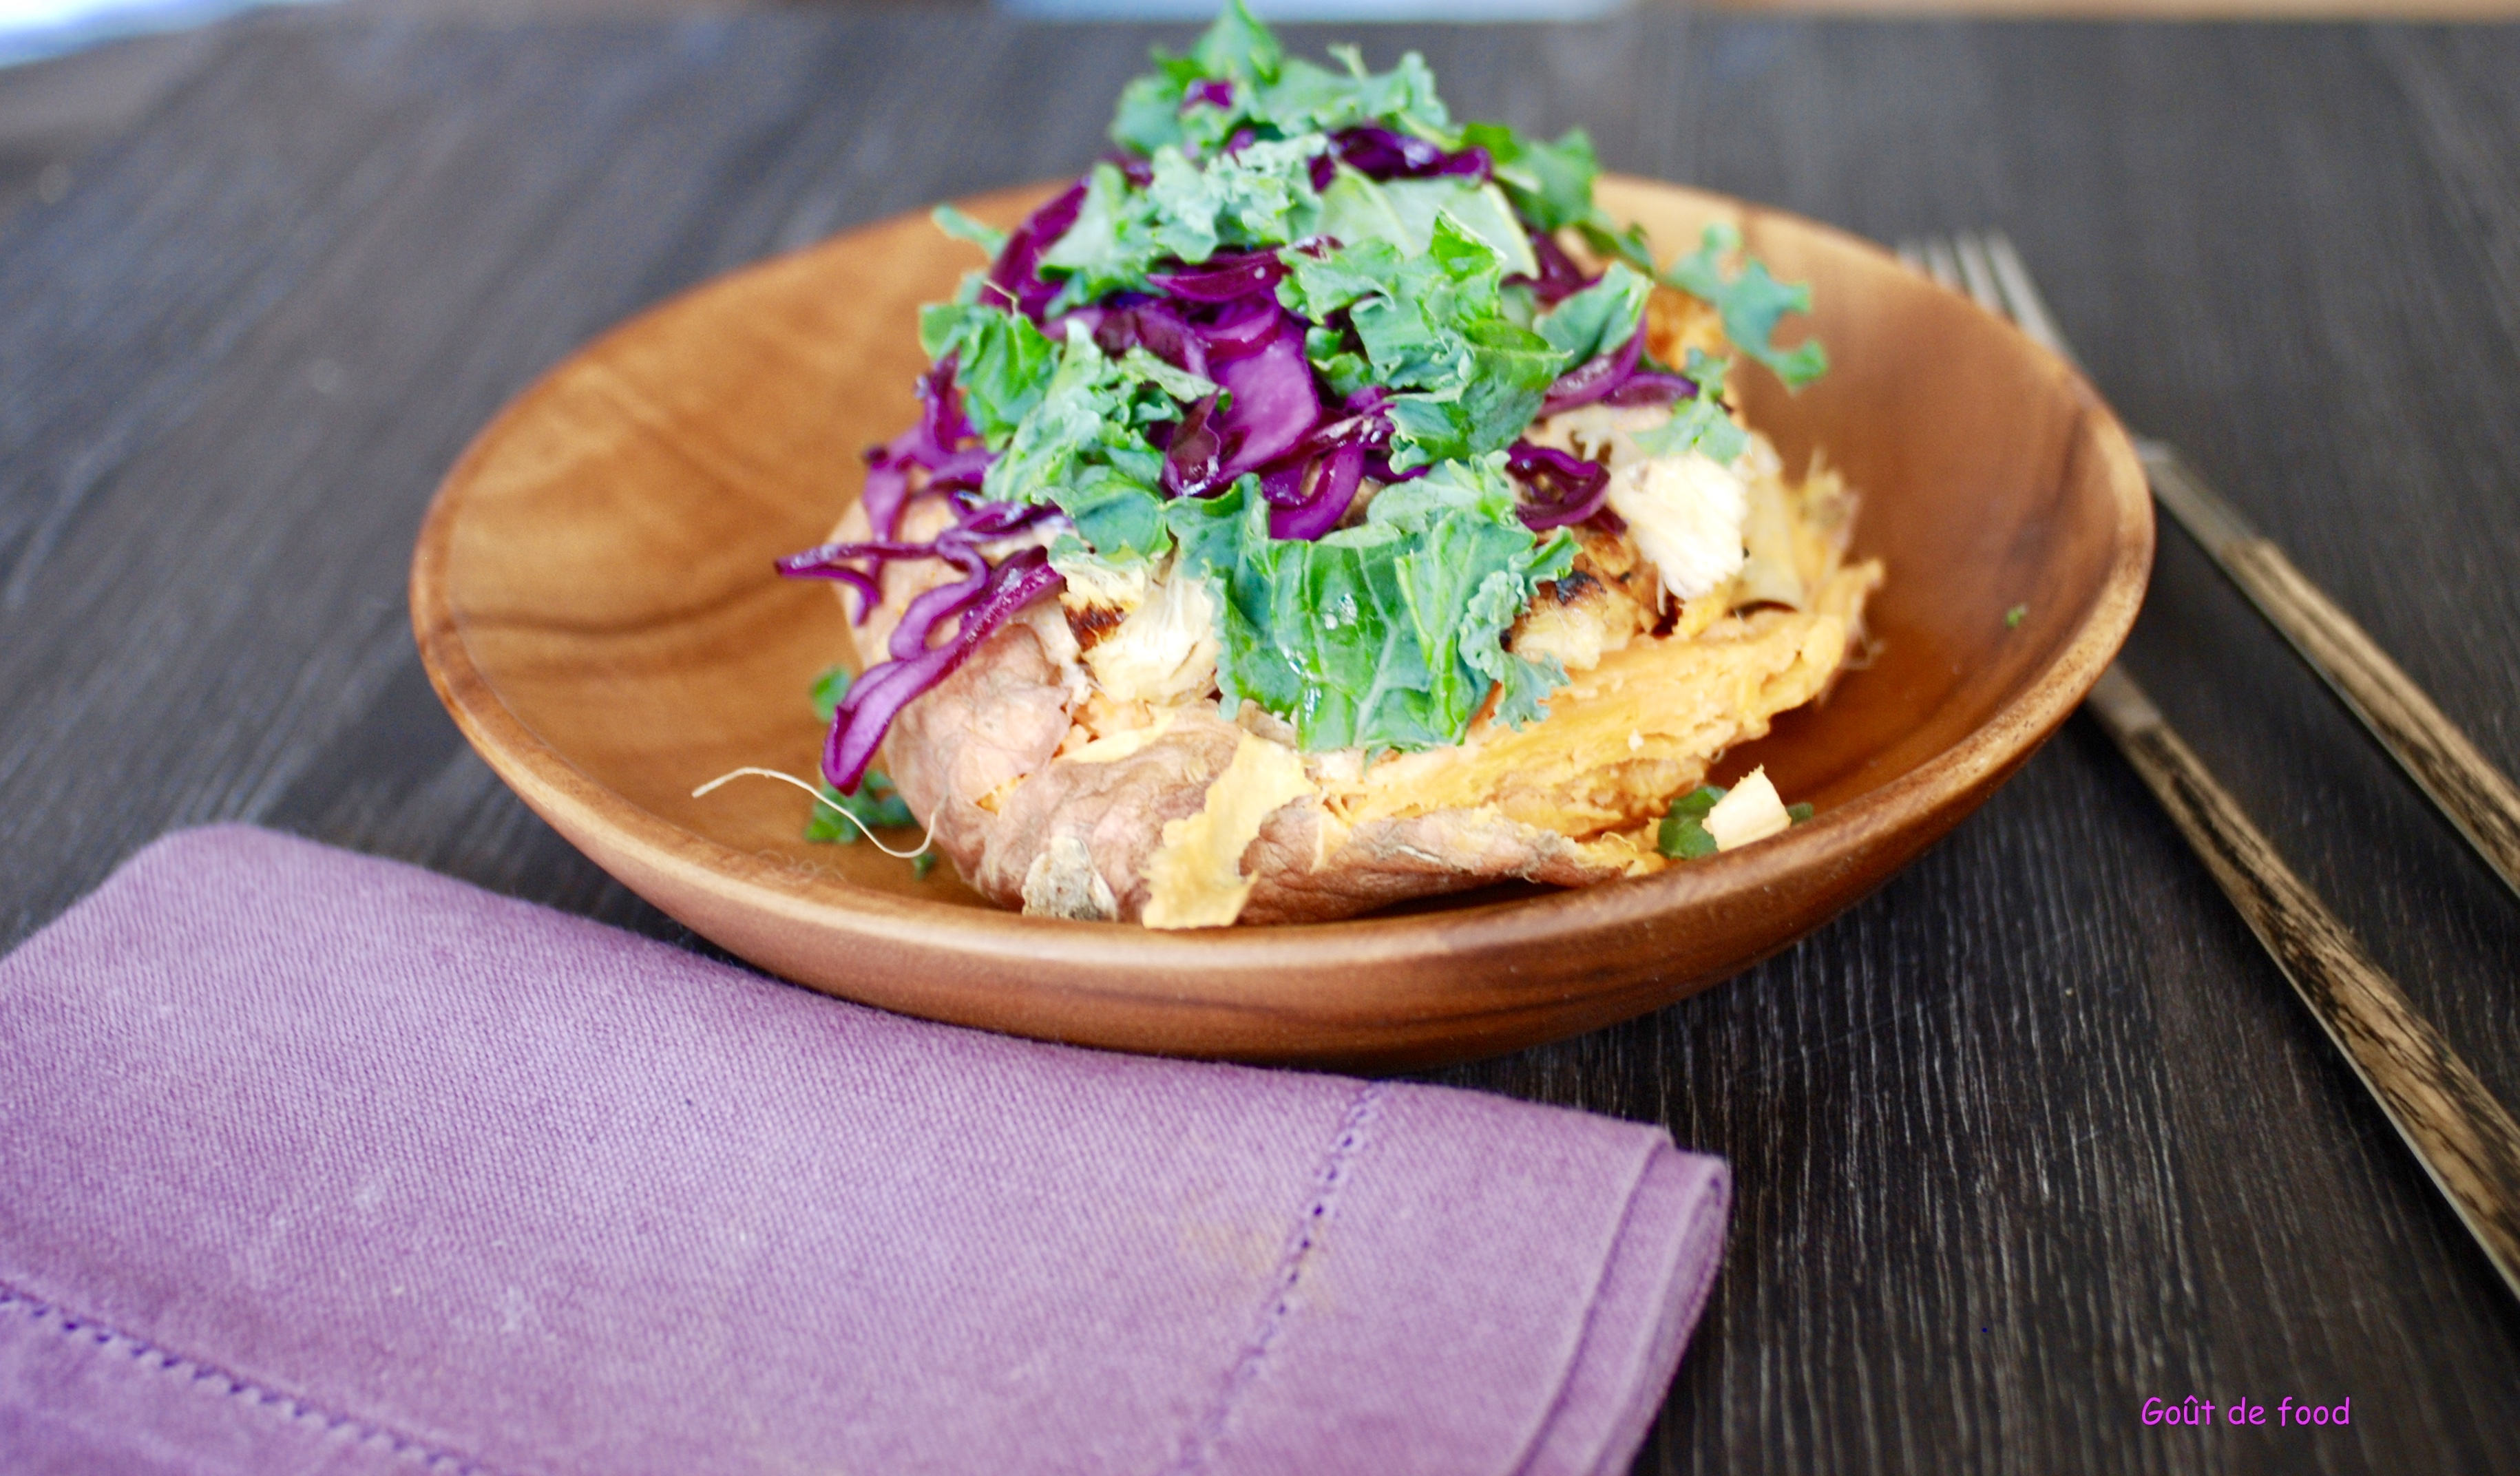 Thibaut Geoffray - Patate douce - poulet -chou rouge -chou kale